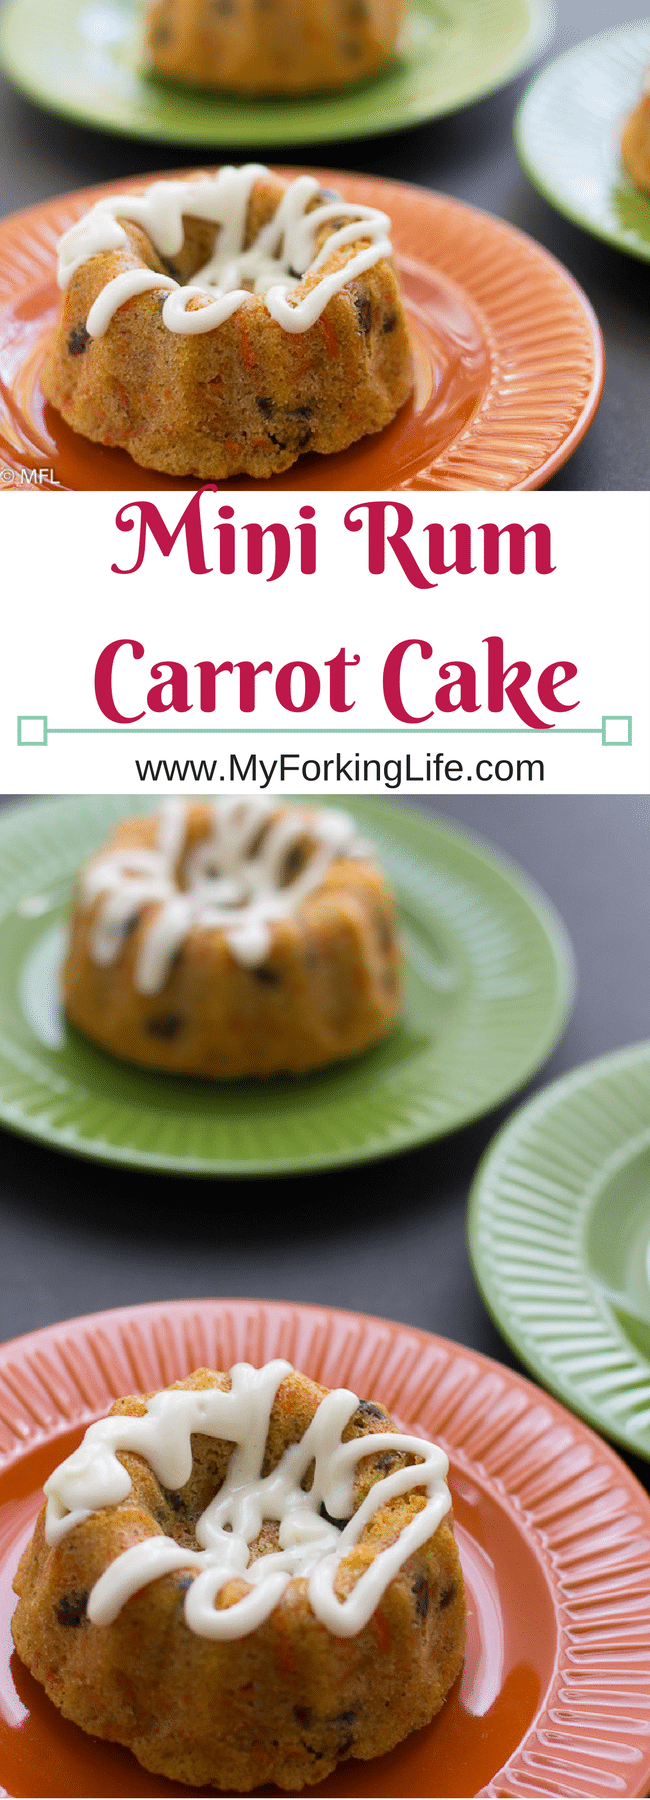 Cute Mini Rum Carrot Cake Recipe. Perfect for gift giving. Perfect mini boozy dessert for Valentine's Day/